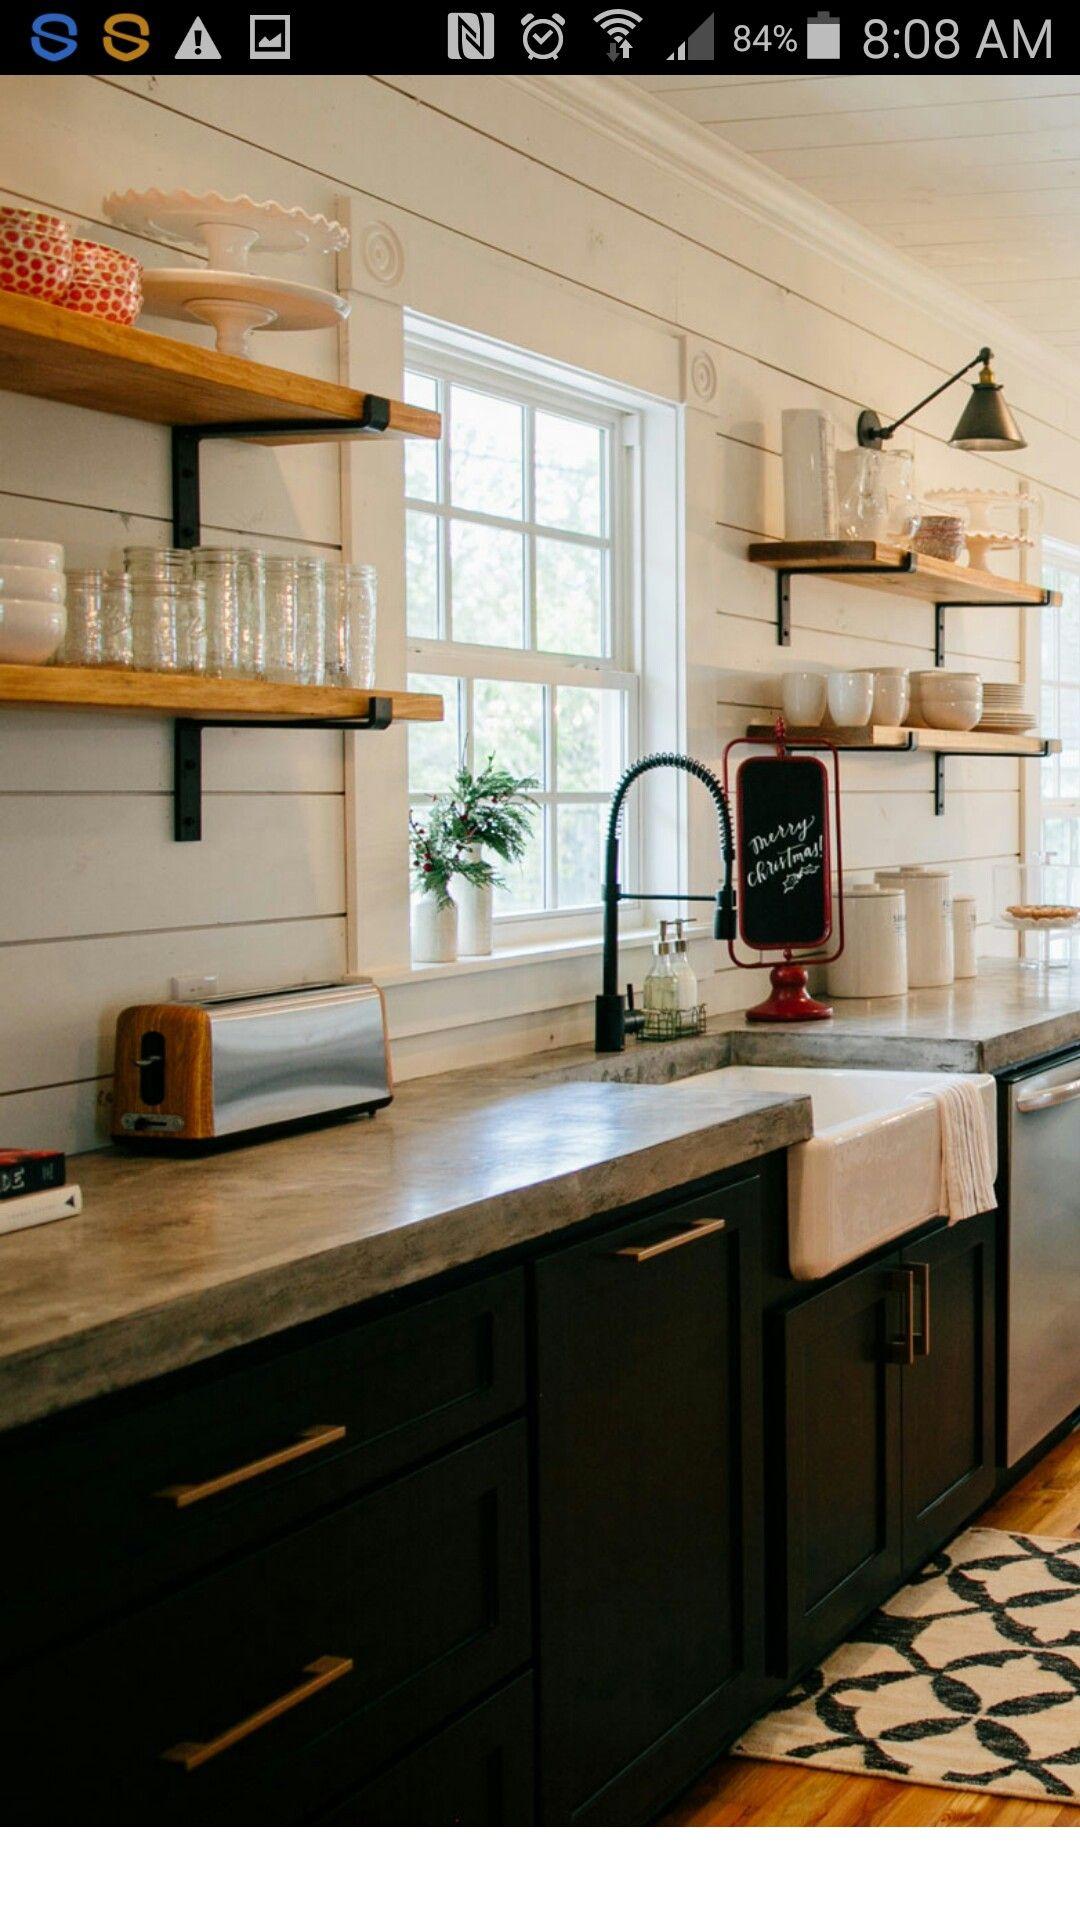 Concrete Countertop Cocinas Reformadas Diseno De Cocina